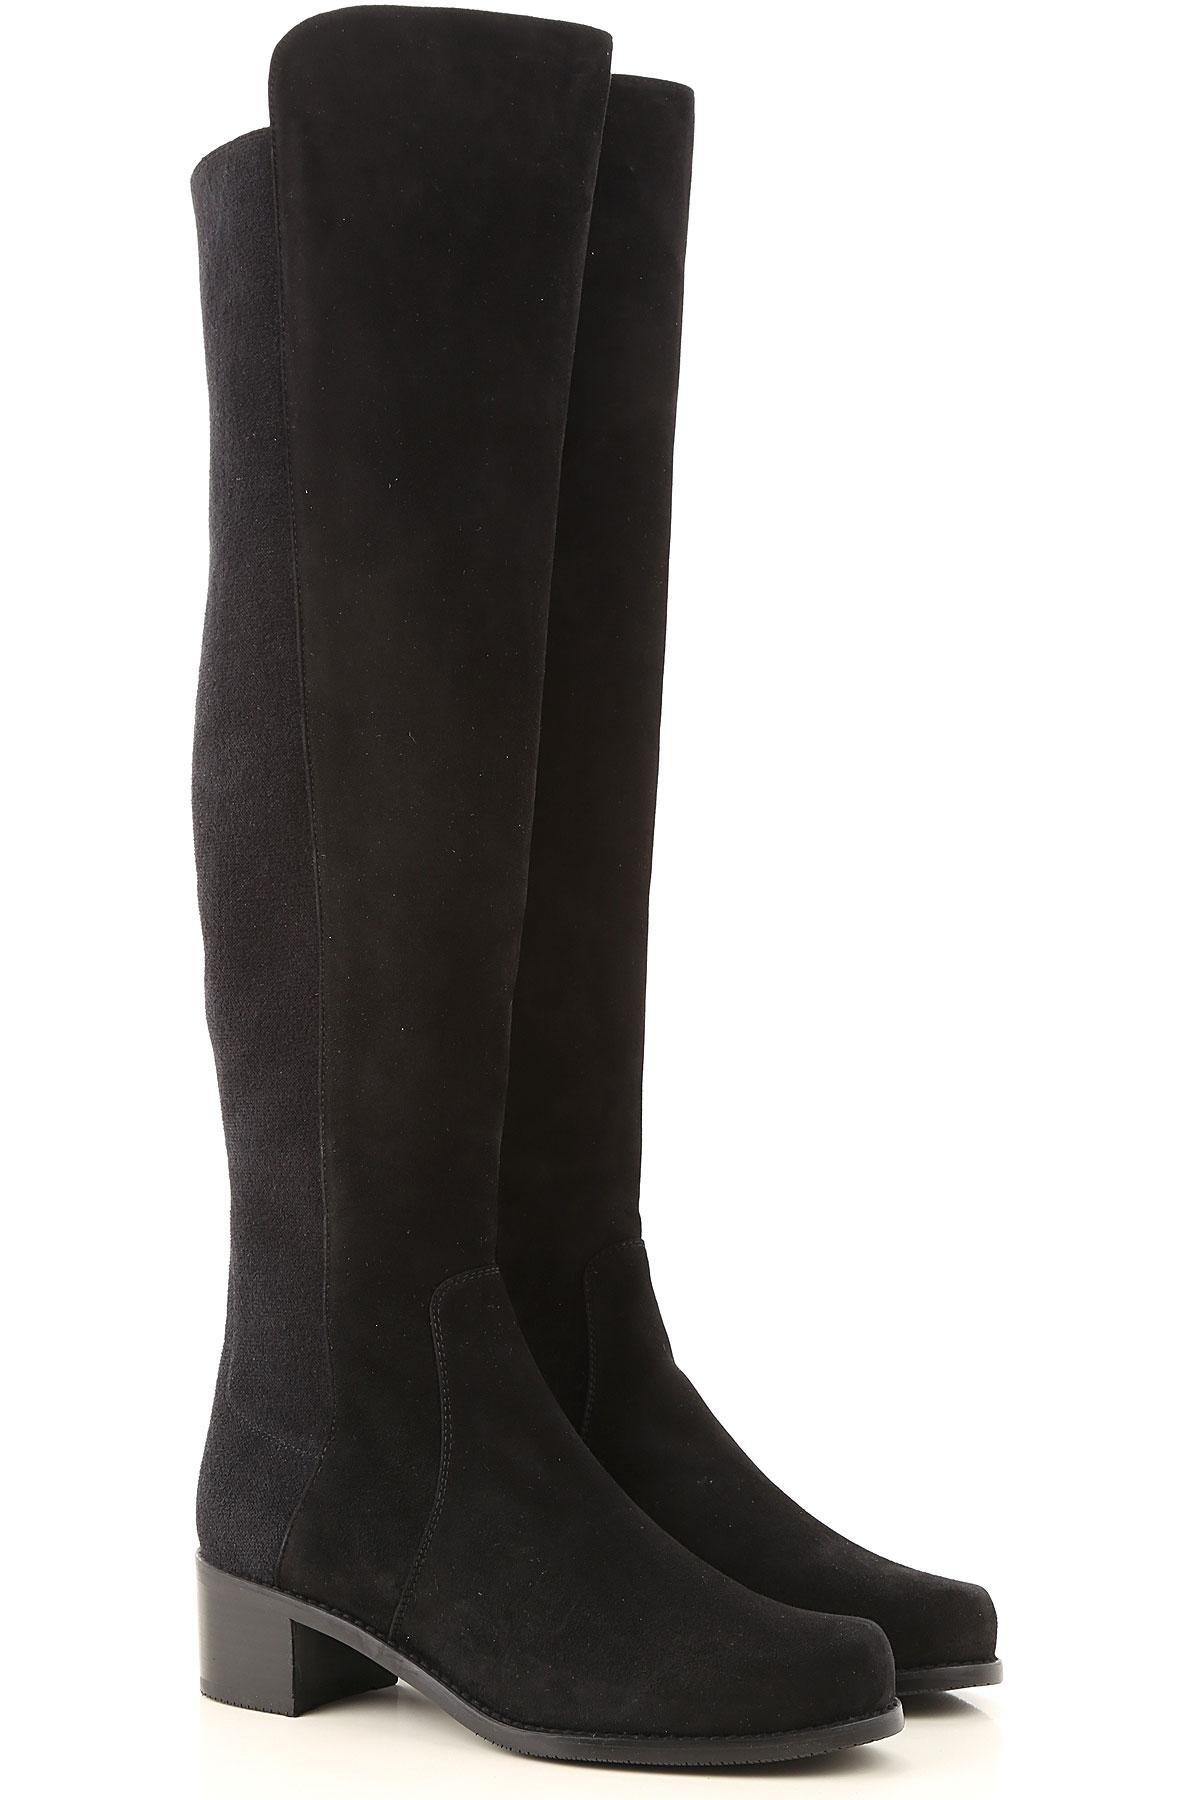 Stuart Weitzman Boots for Women, Booties On Sale, Black, suede, 2019, US 8.5 (EU 39) US 9.5 (EU 40)